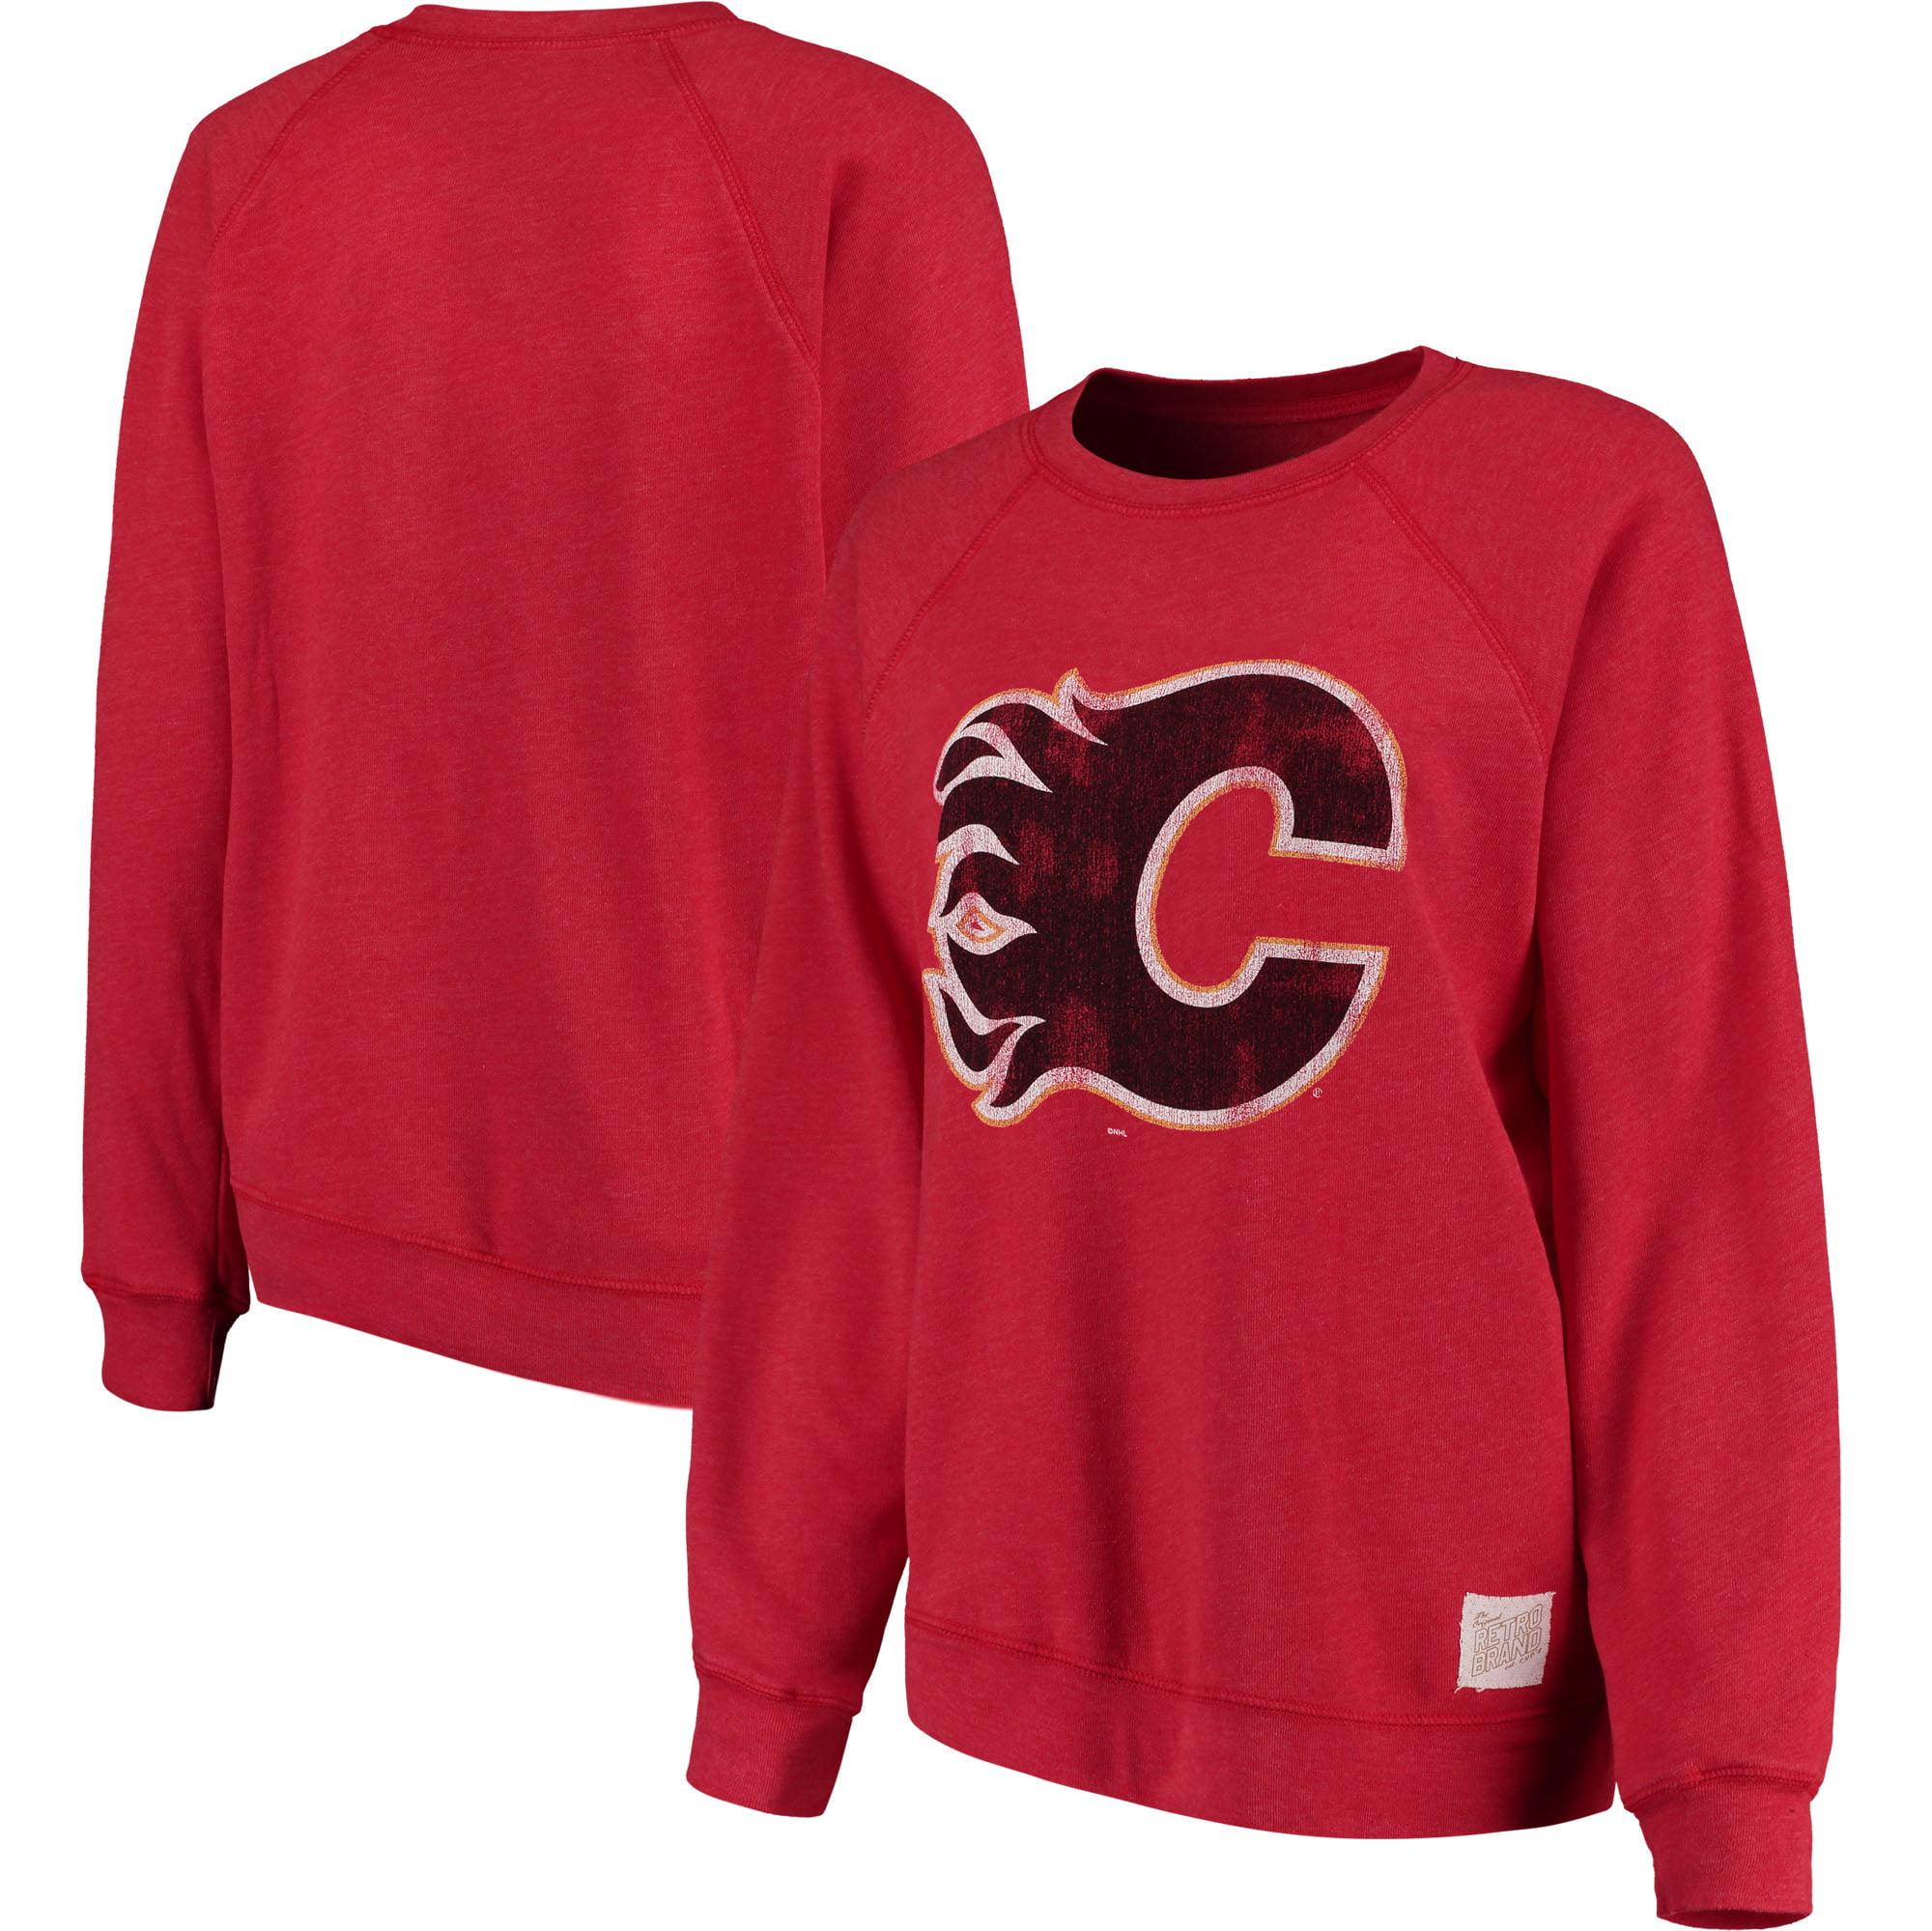 Calgary Flames Original Retro Brand Women's Vintage Tri-Blend Pullover Sweatshirt - Red